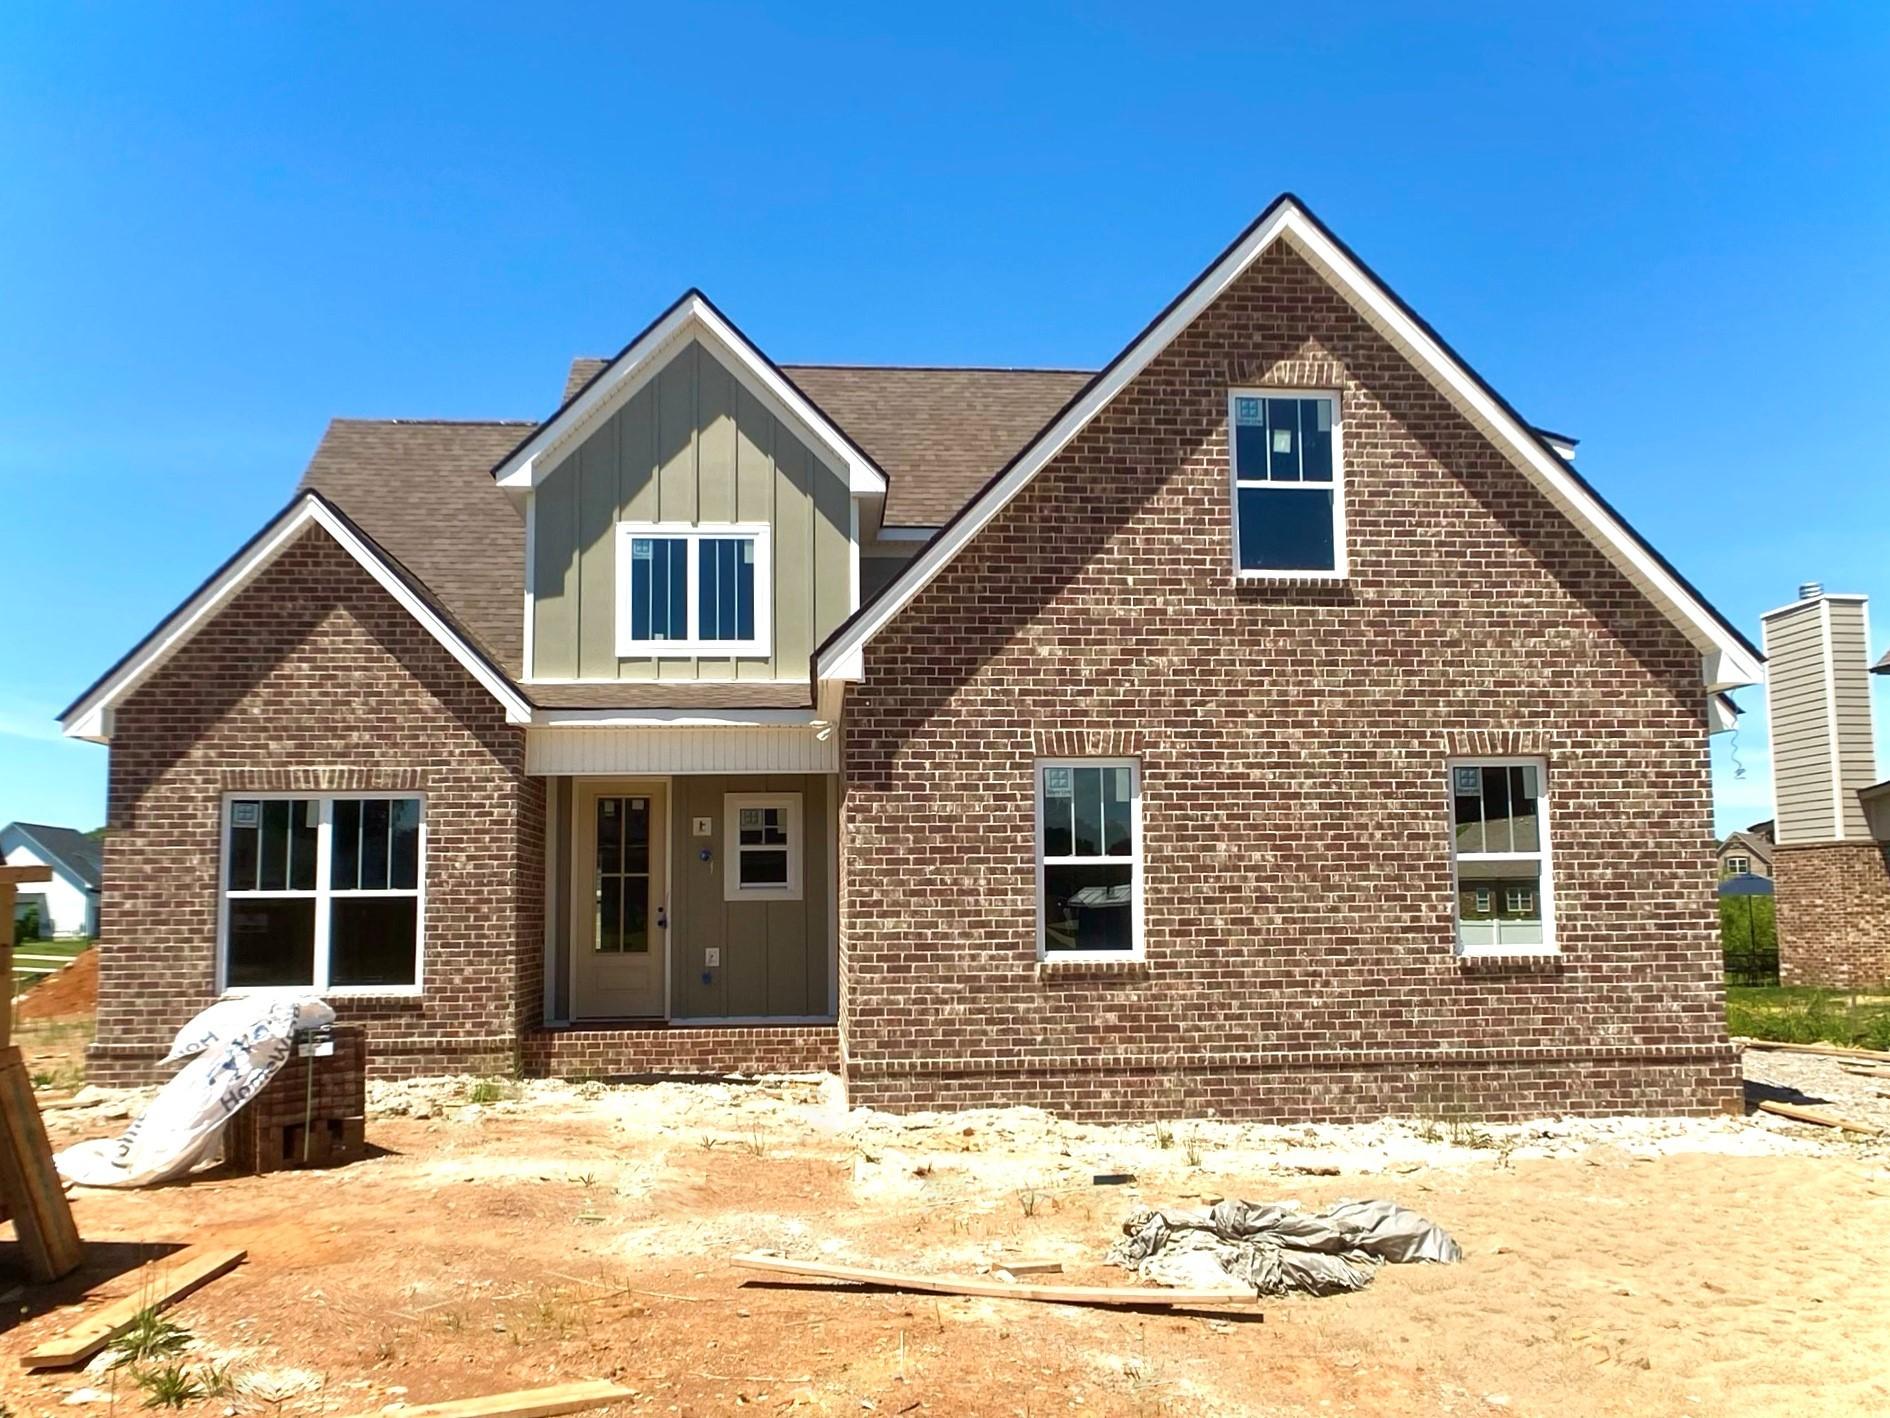 58 Bluegill Ct Property Photo - Murfreesboro, TN real estate listing